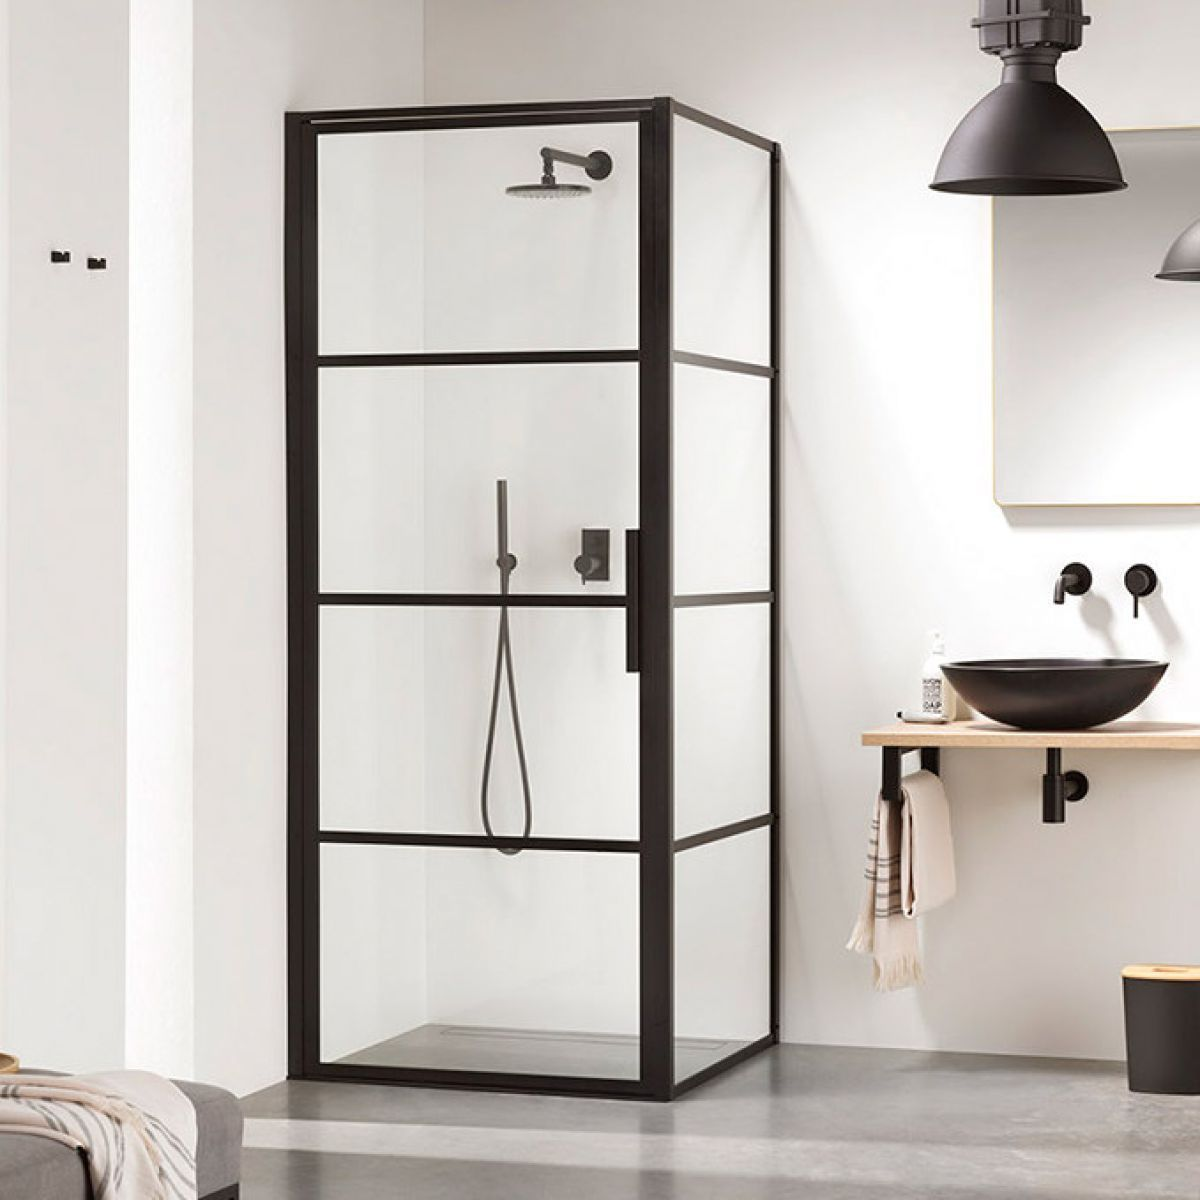 Impey Soho Pivot Door Black Shower Enclosure In 2020 Black Shower Doors Shower Doors Bathroom Trends